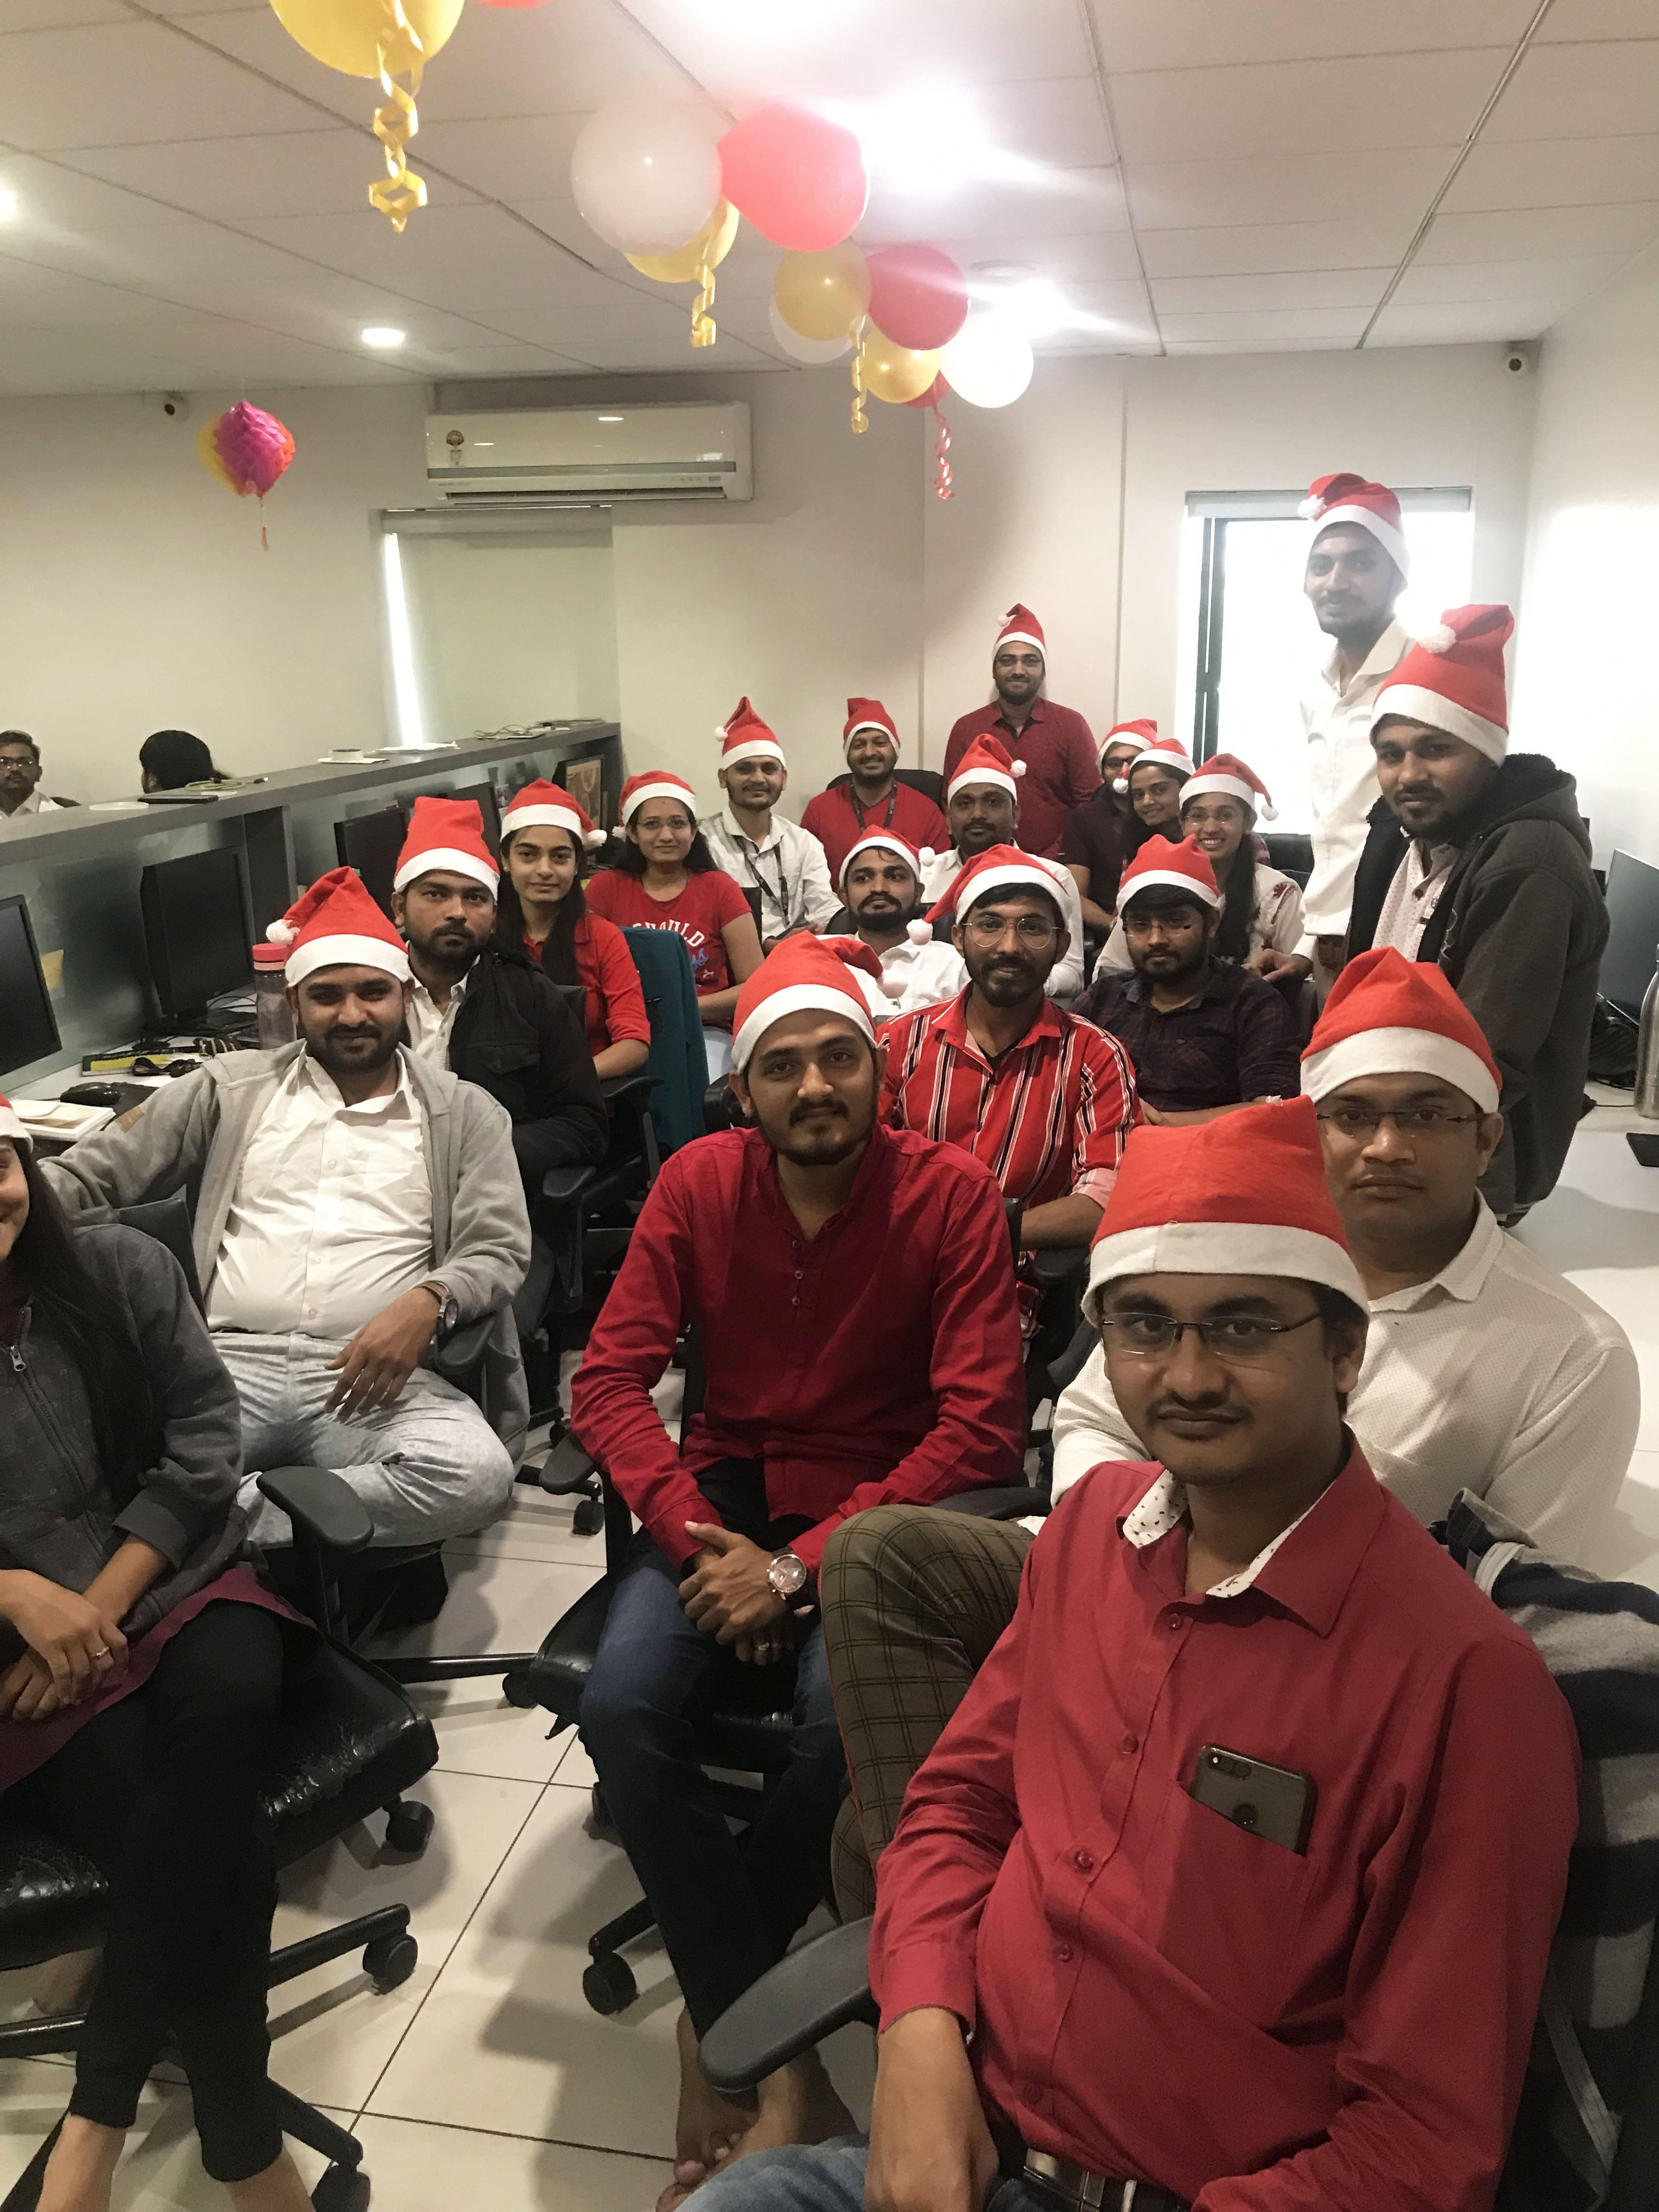 XMas Celebrations at Logistic Infotech